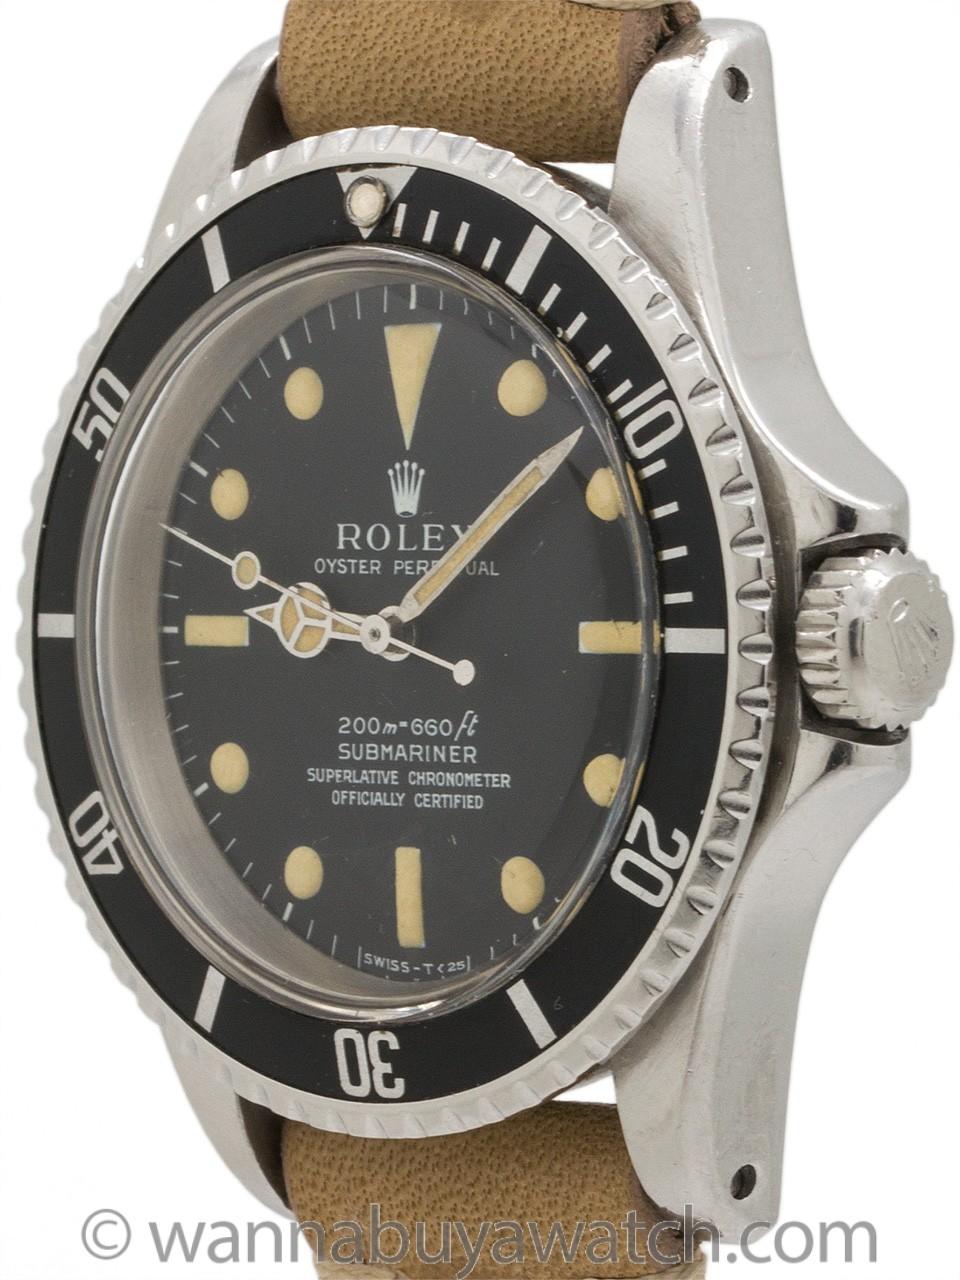 Rolex Submariner ref 5512 Meters First circa 1967